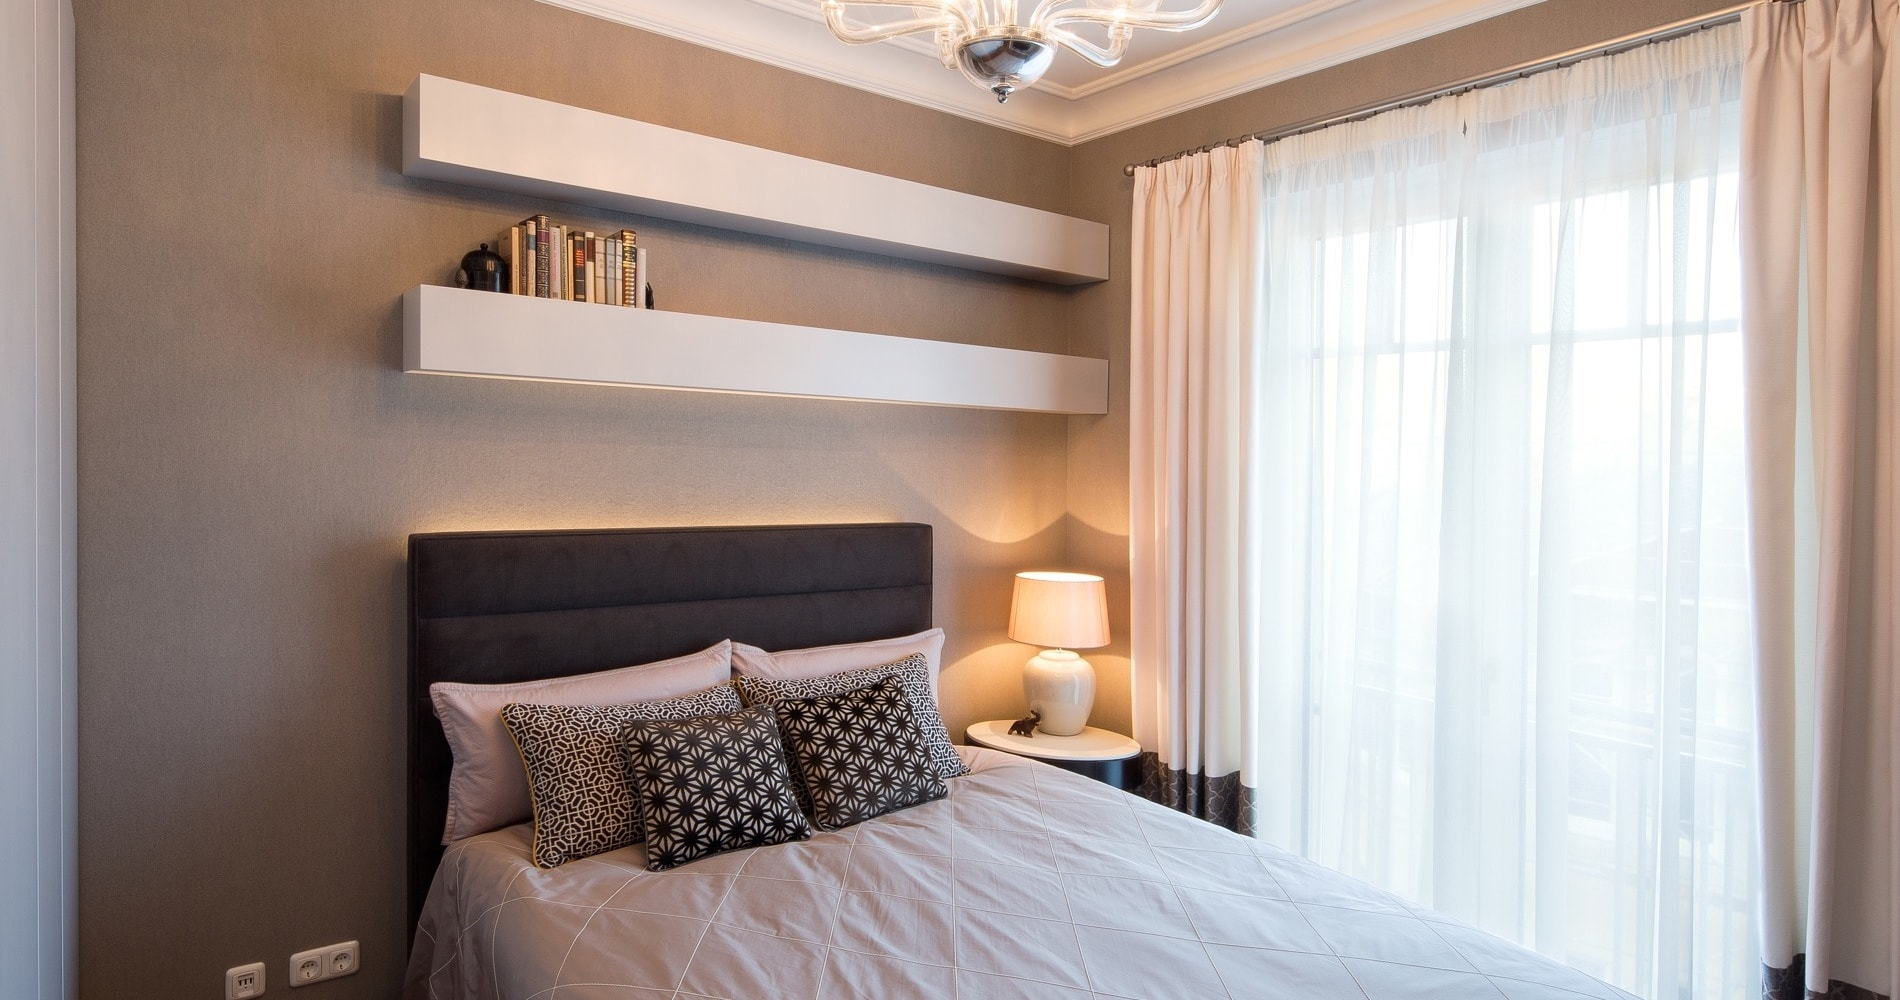 m beldesign berlin kjubik innenarchitektur. Black Bedroom Furniture Sets. Home Design Ideas